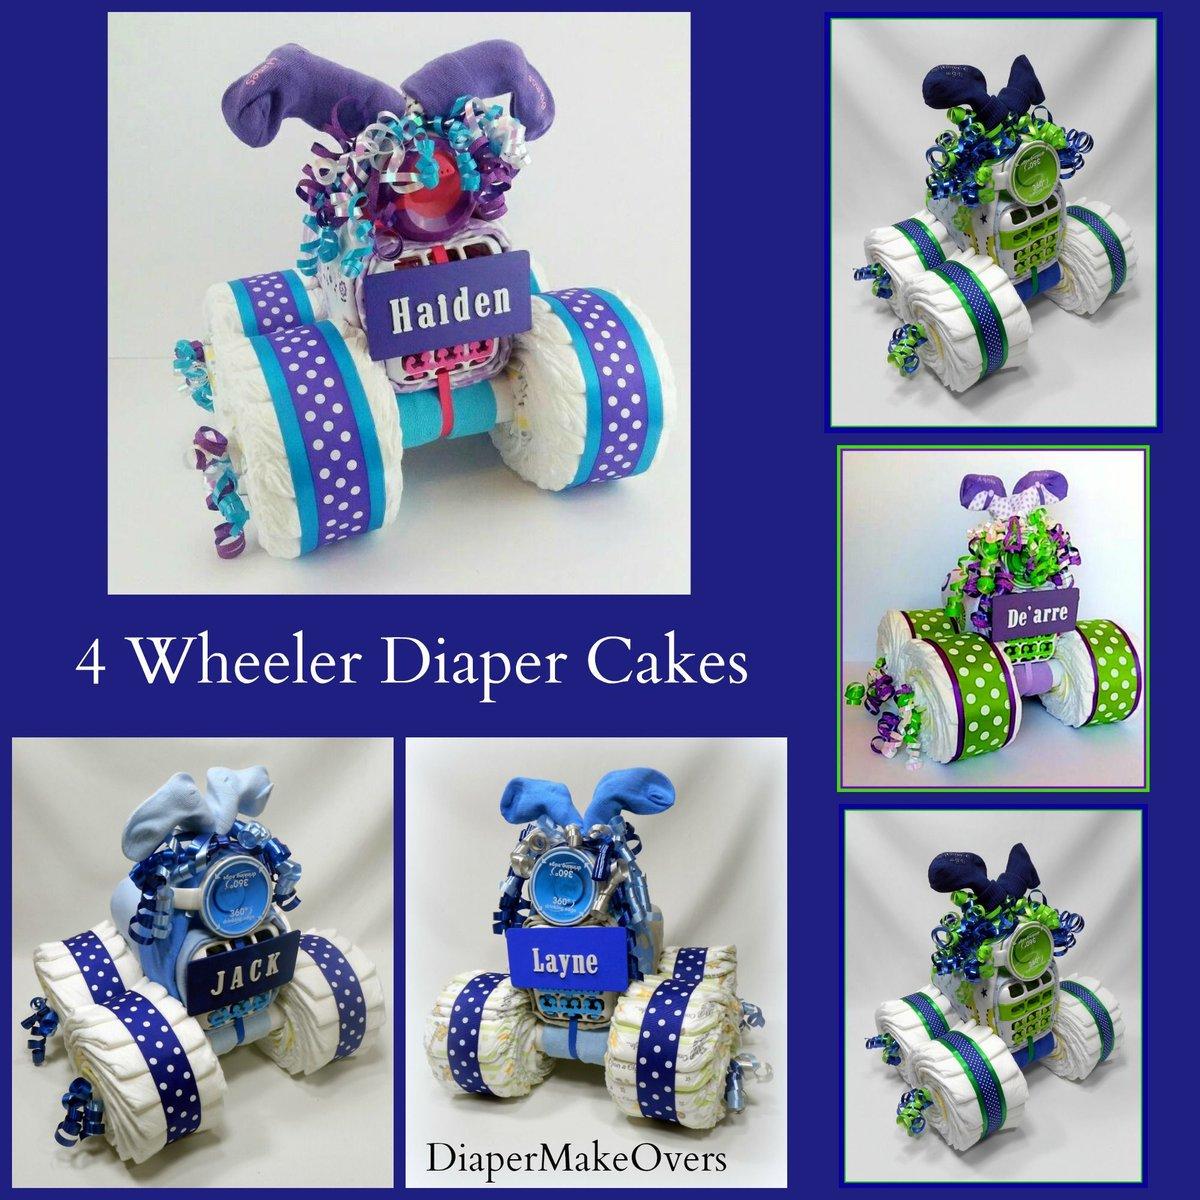 https://buff.ly/2ZTE40e #epiconetsy #shopsmall #etsyshop #babyshower #diapercake #babygift #4wheeler #offroad #dadgifts #handmadegiftspic.twitter.com/8QI4Qsr2kH